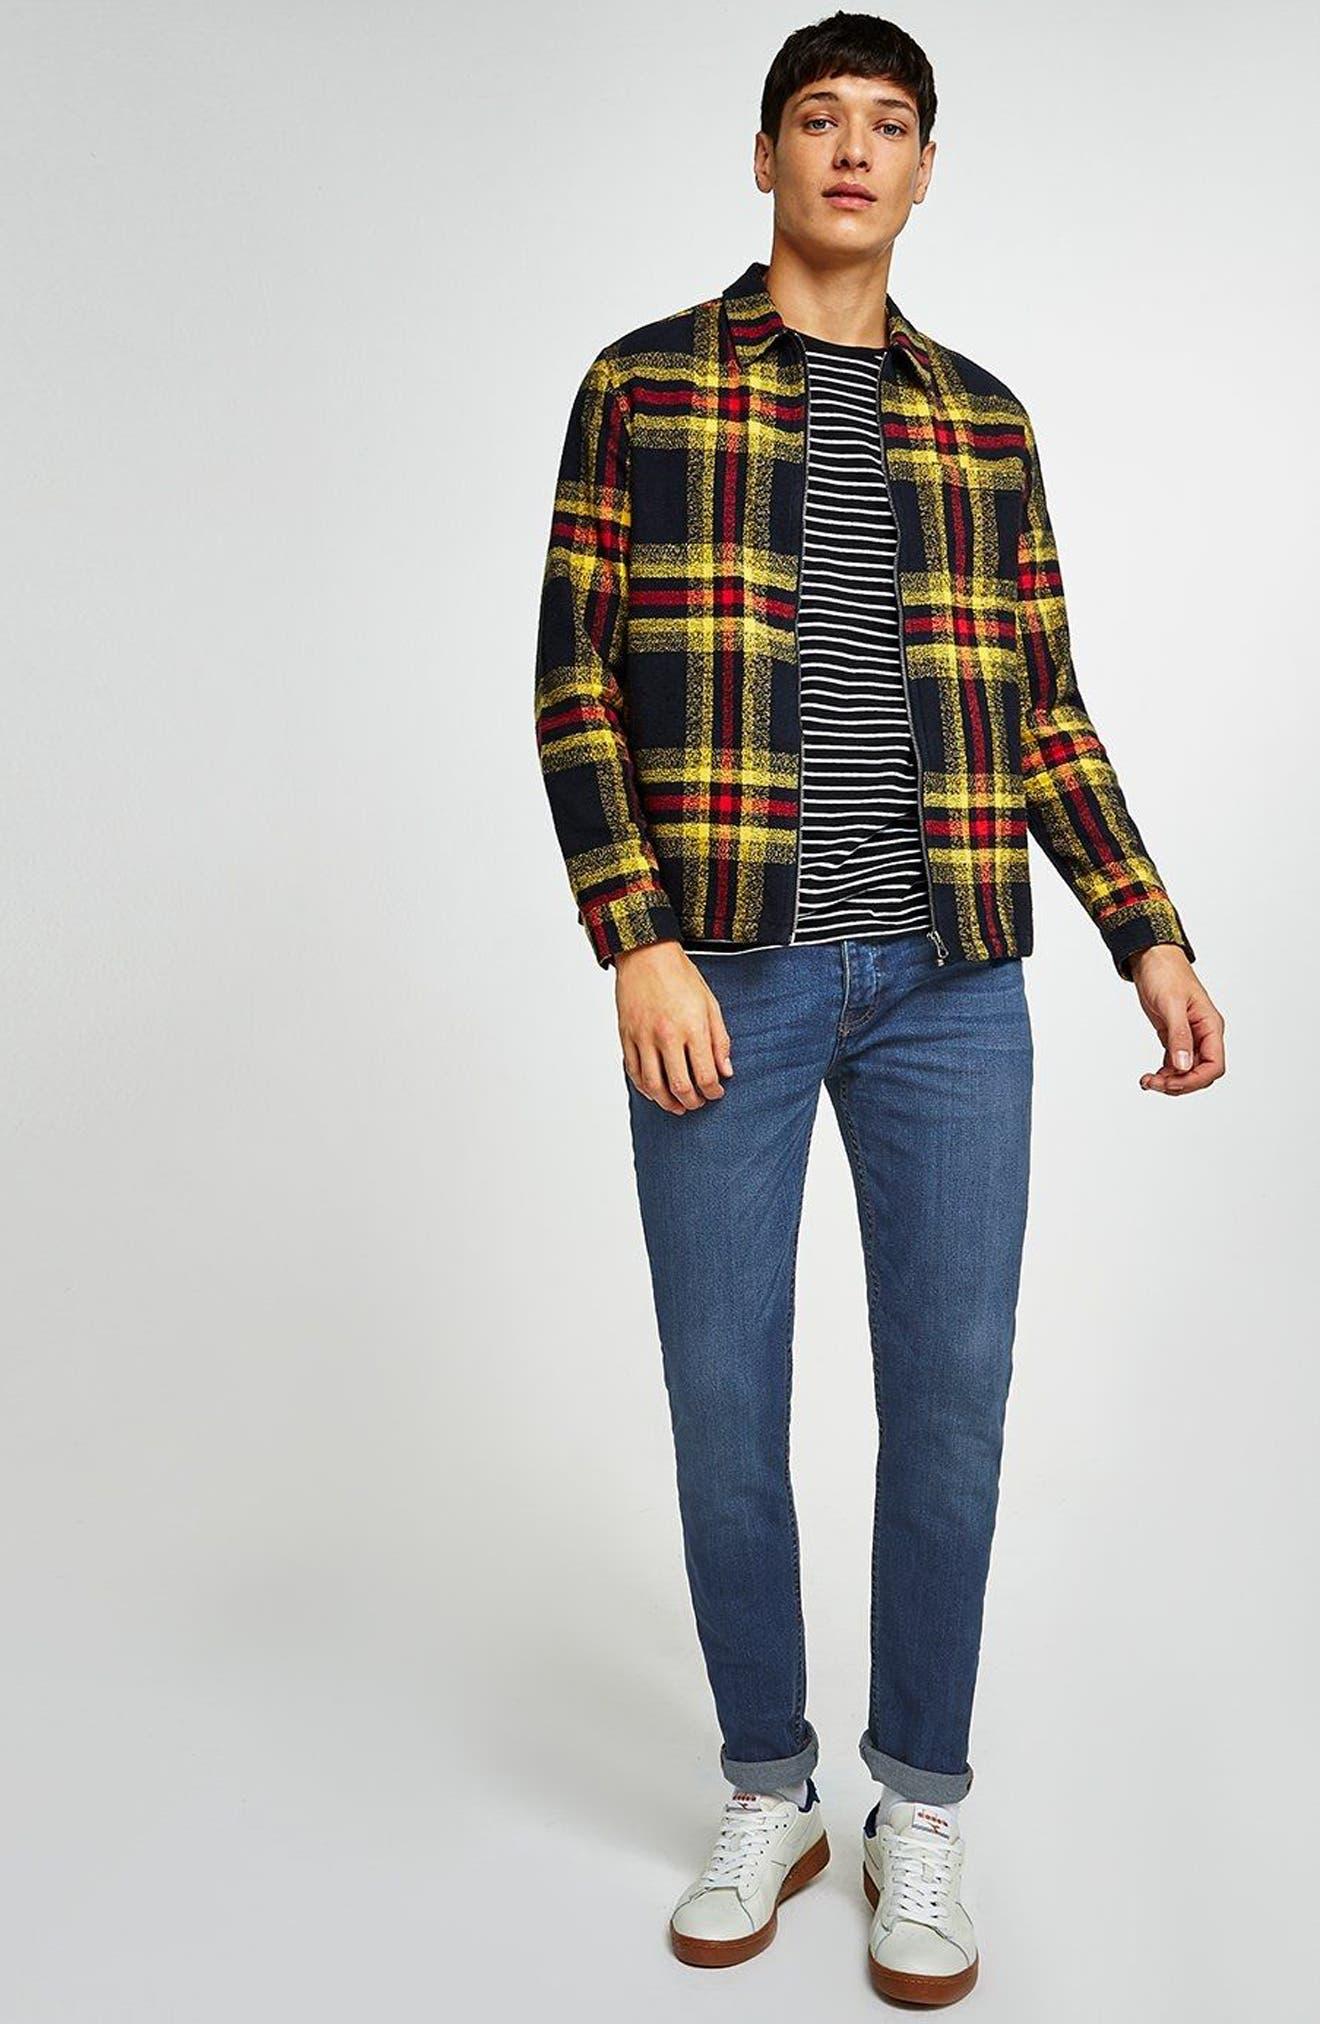 TOPMAN, Stretch Skinny Fit Jeans, Alternate thumbnail 5, color, BLUE